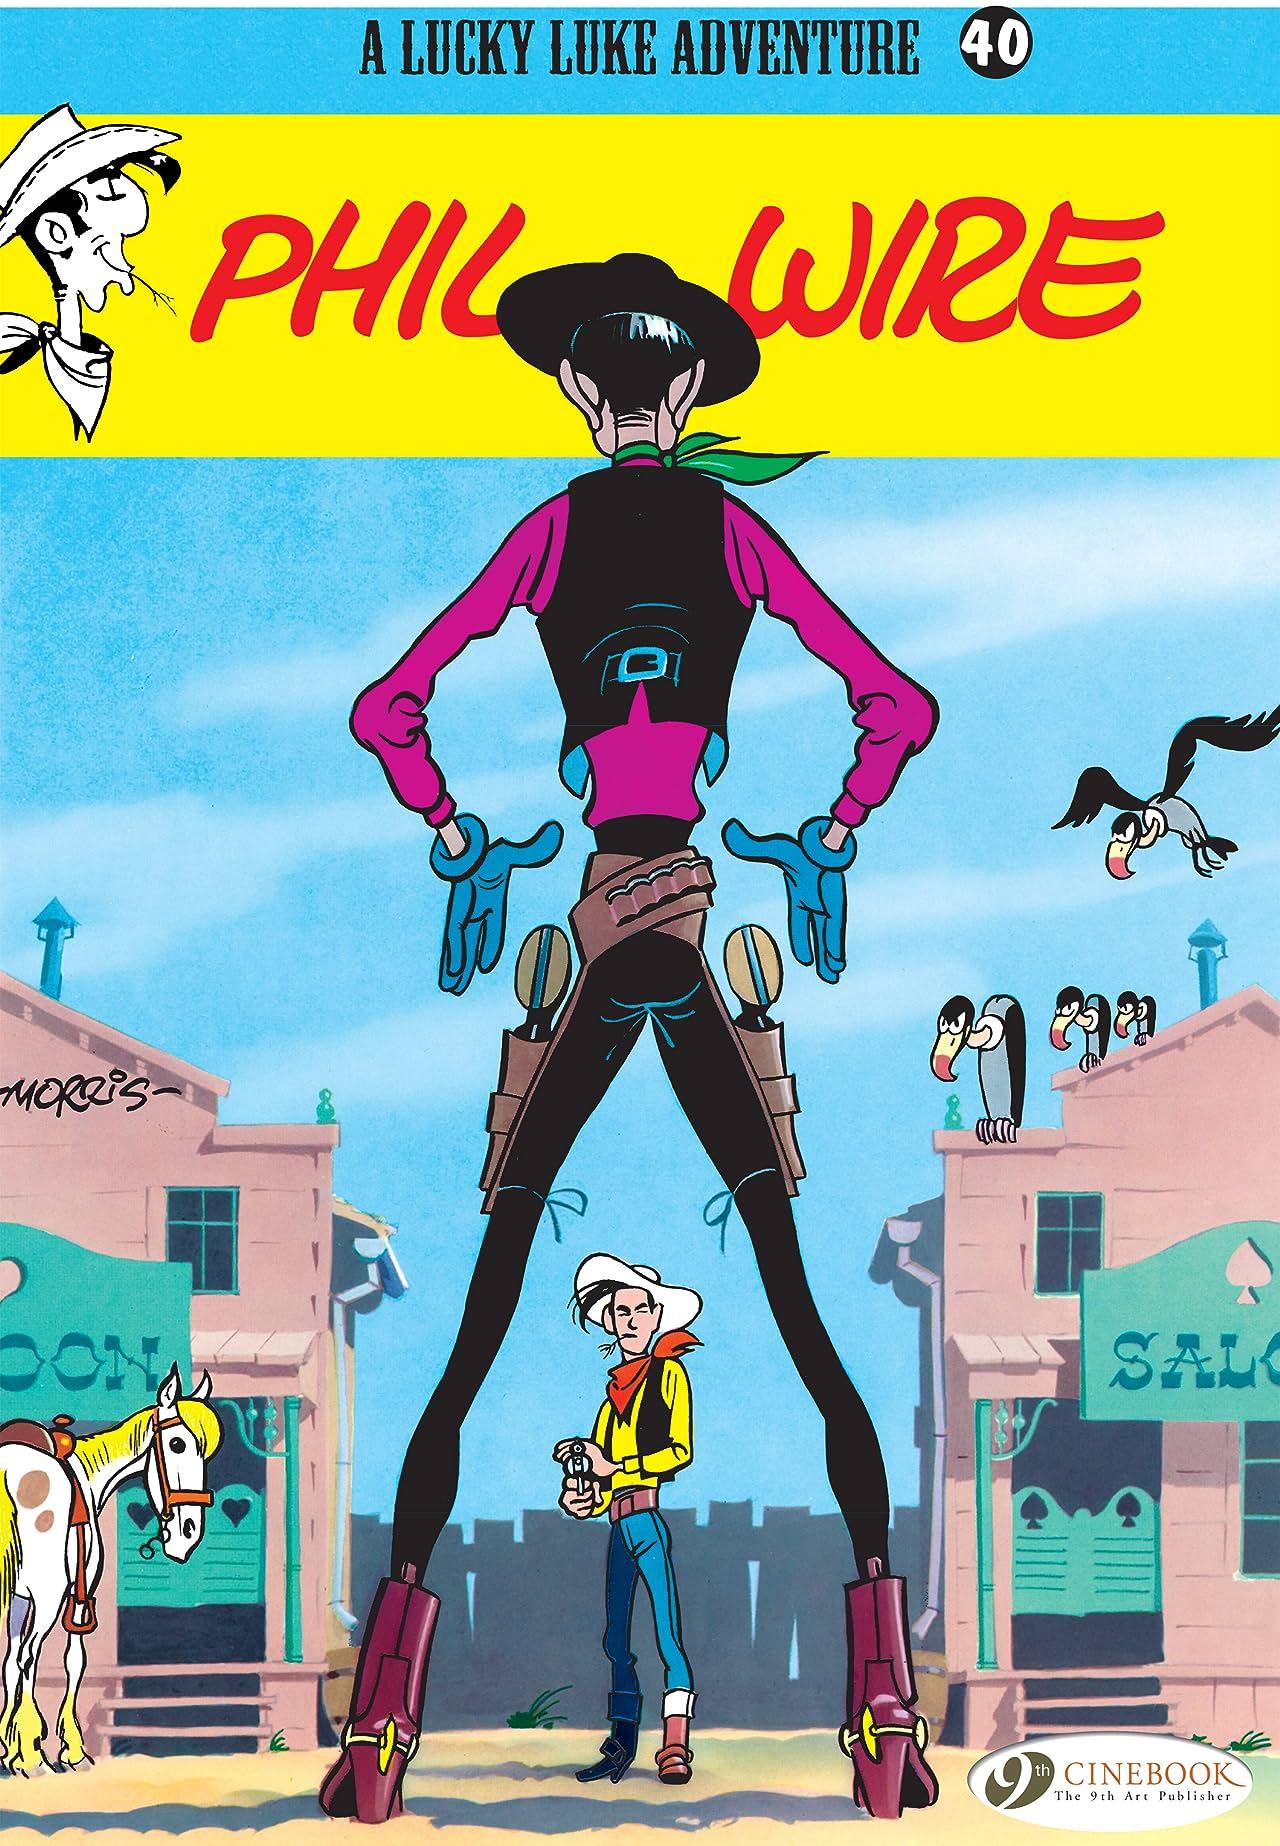 Lucky Luke Vol. 40: Phil Wire